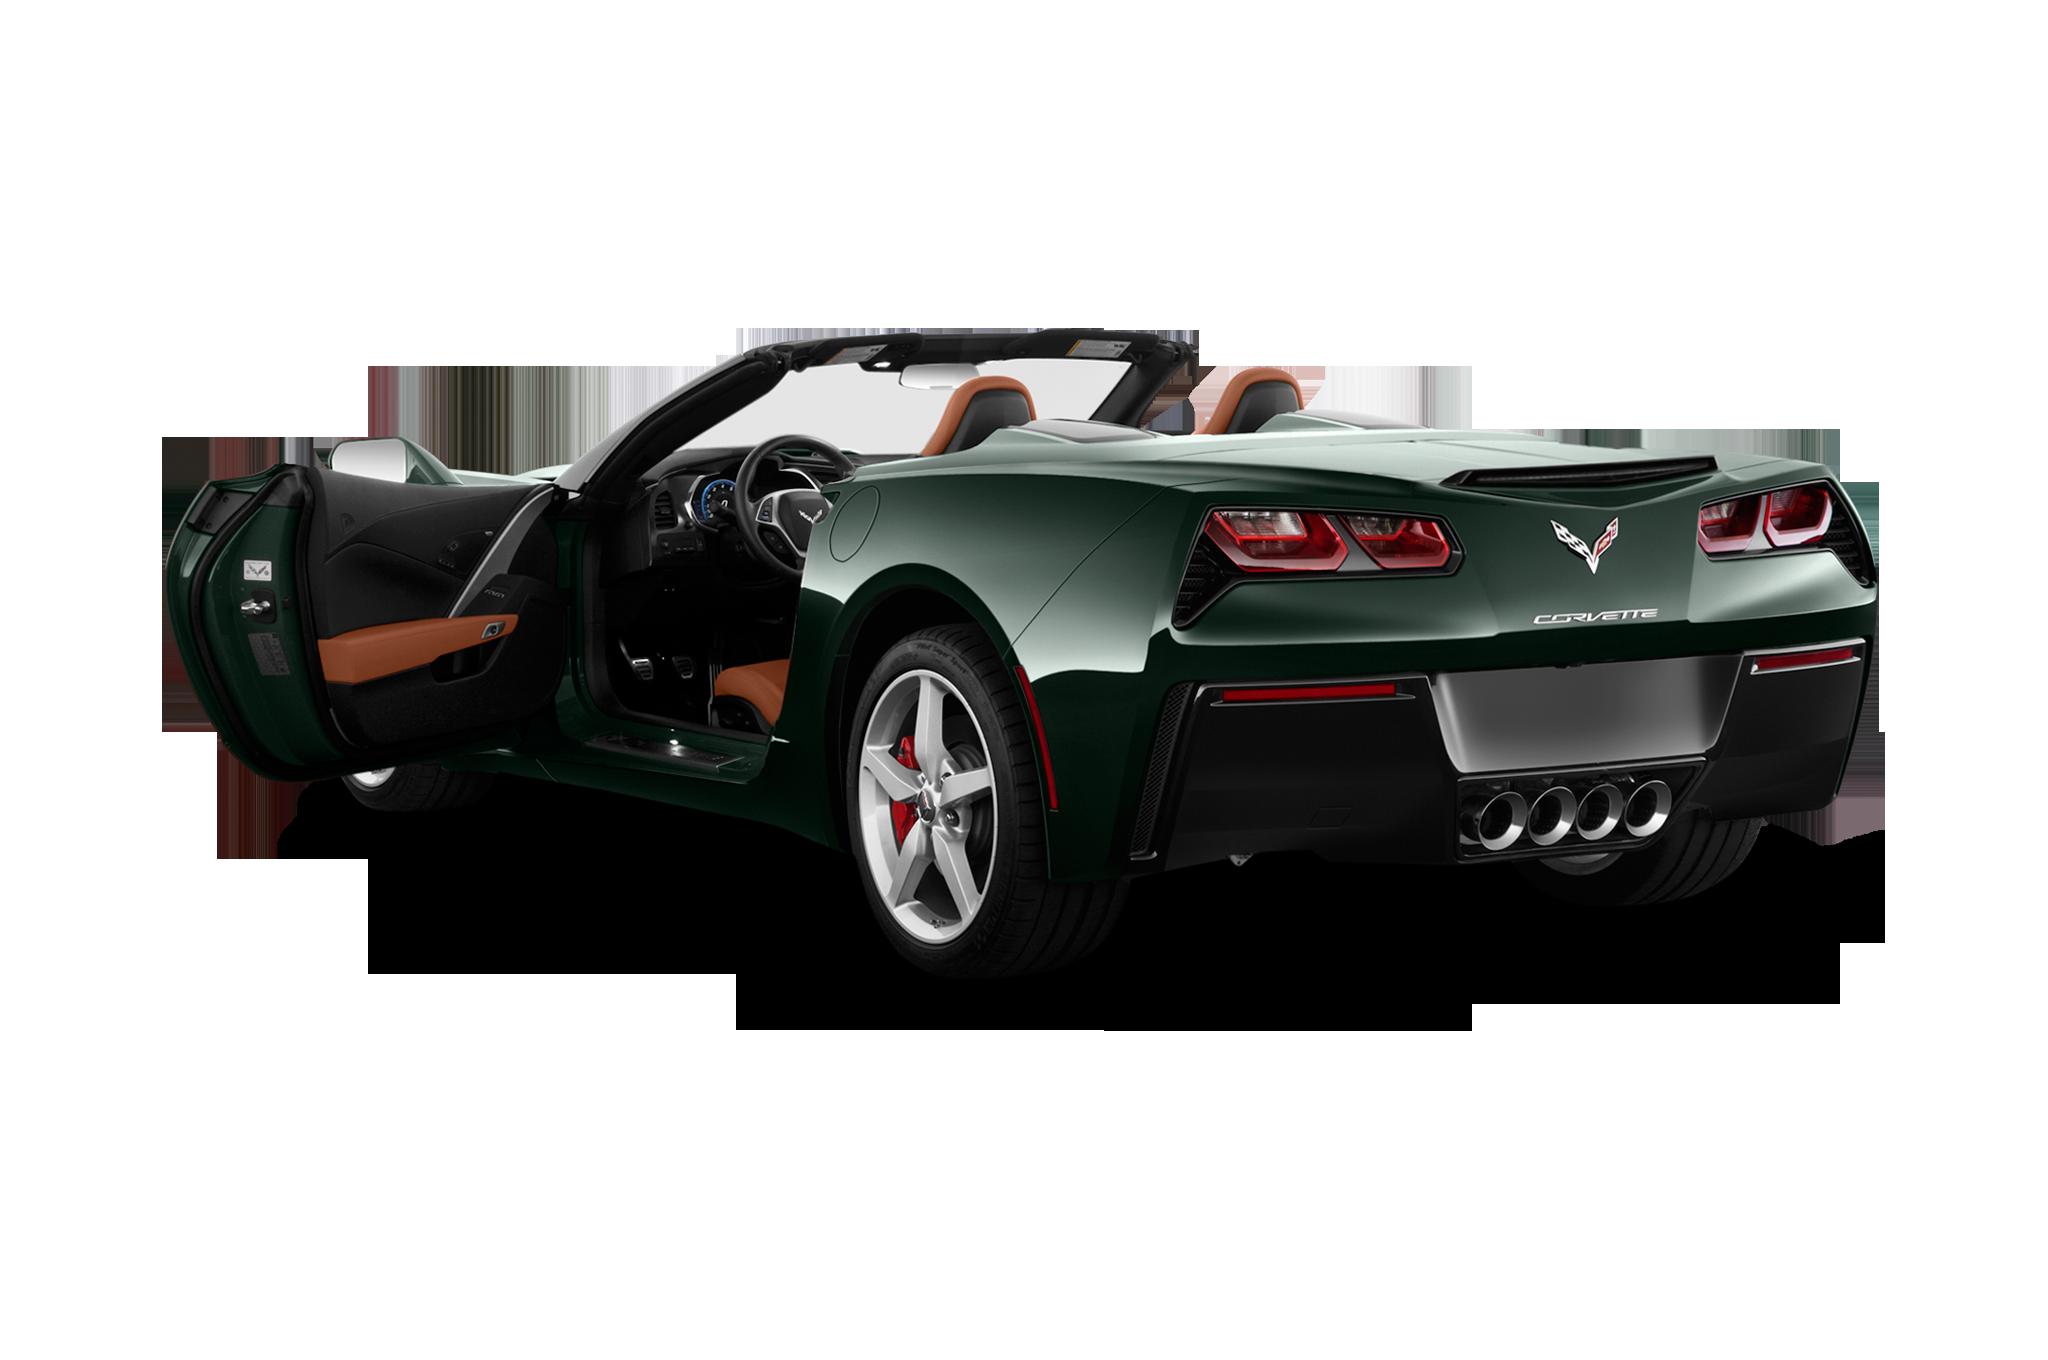 Chevrolet Corvette PNG Image